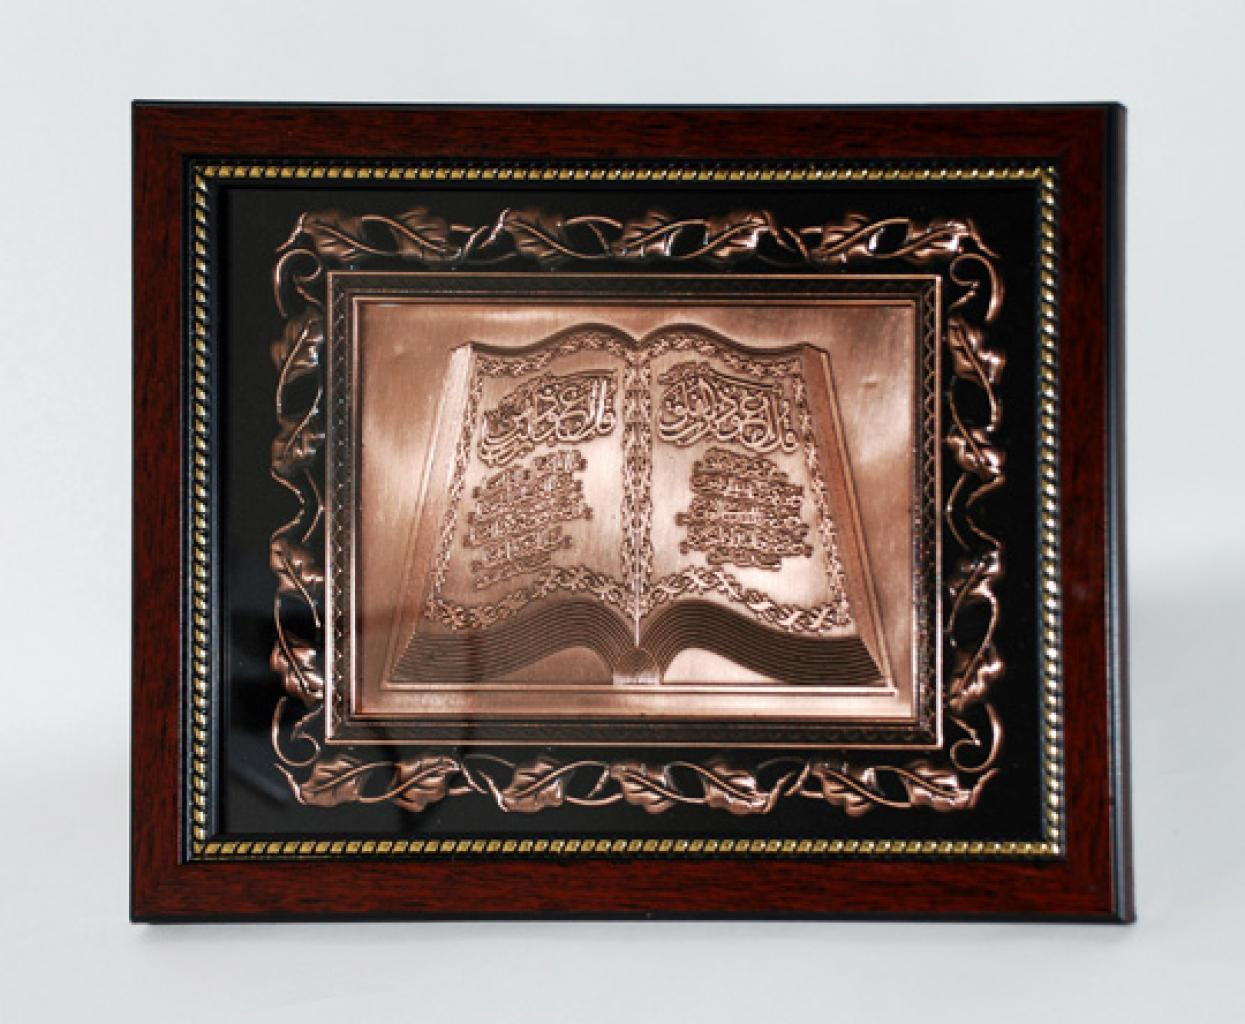 Framed Quran Surahs gi521